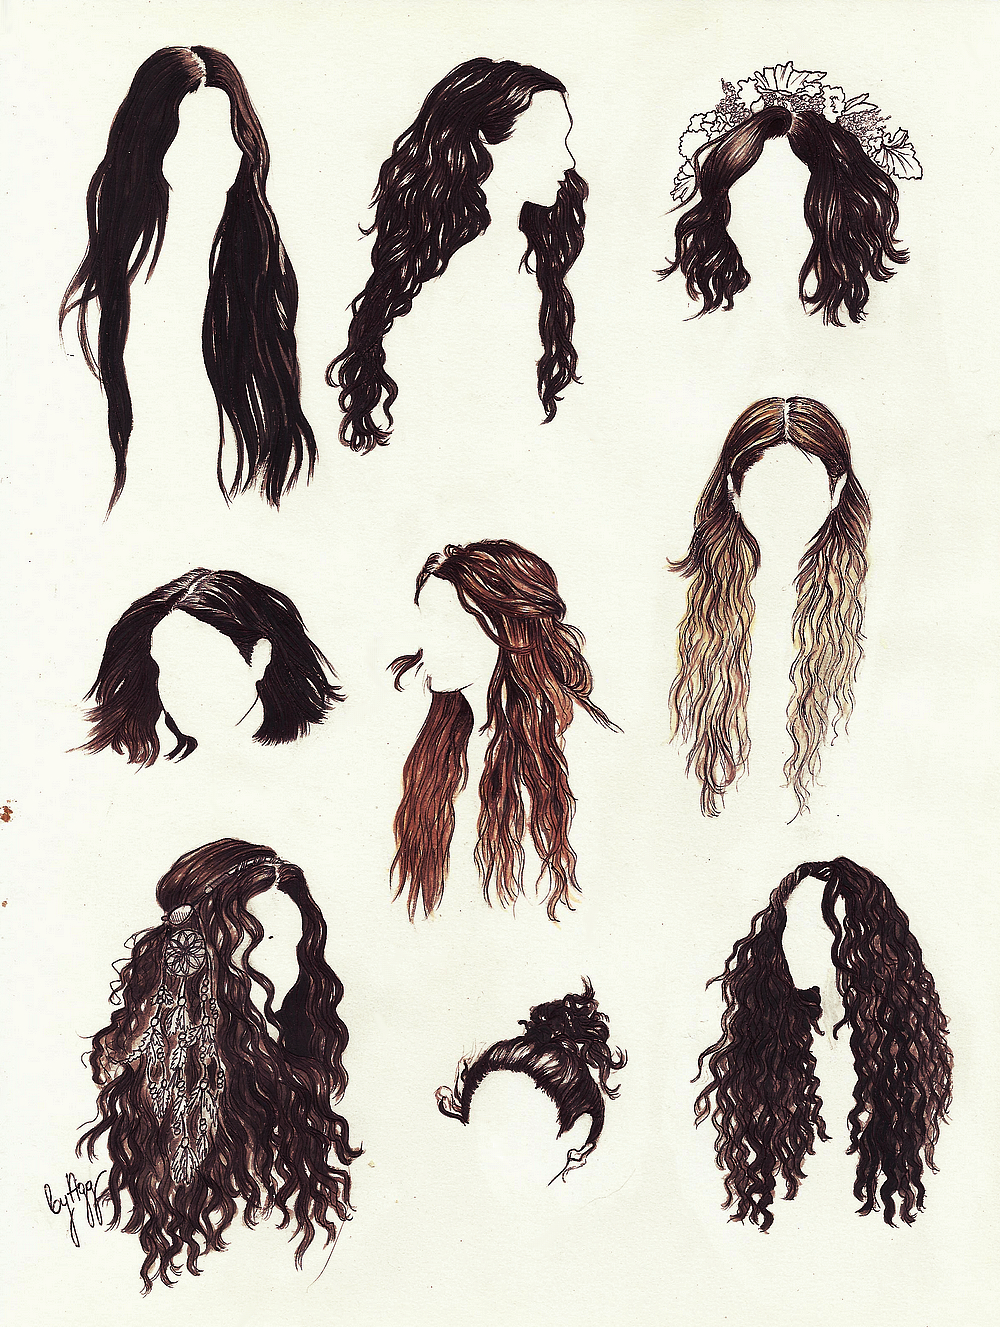 aggsart - Vanessa Hudgens' hair history (well a pa